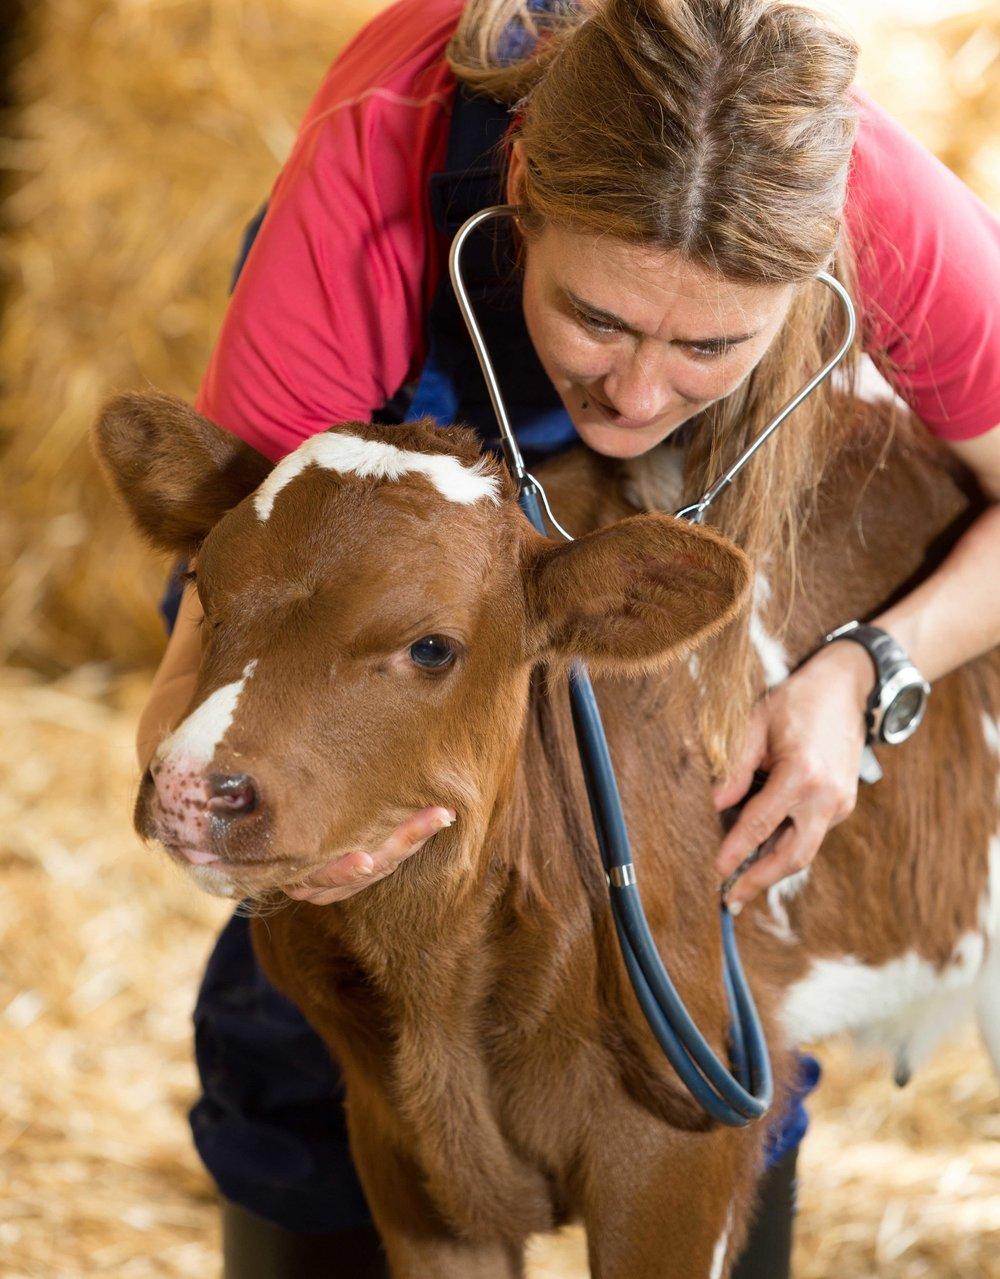 AdobeStock_83156091 calf with veterinarian.jpg